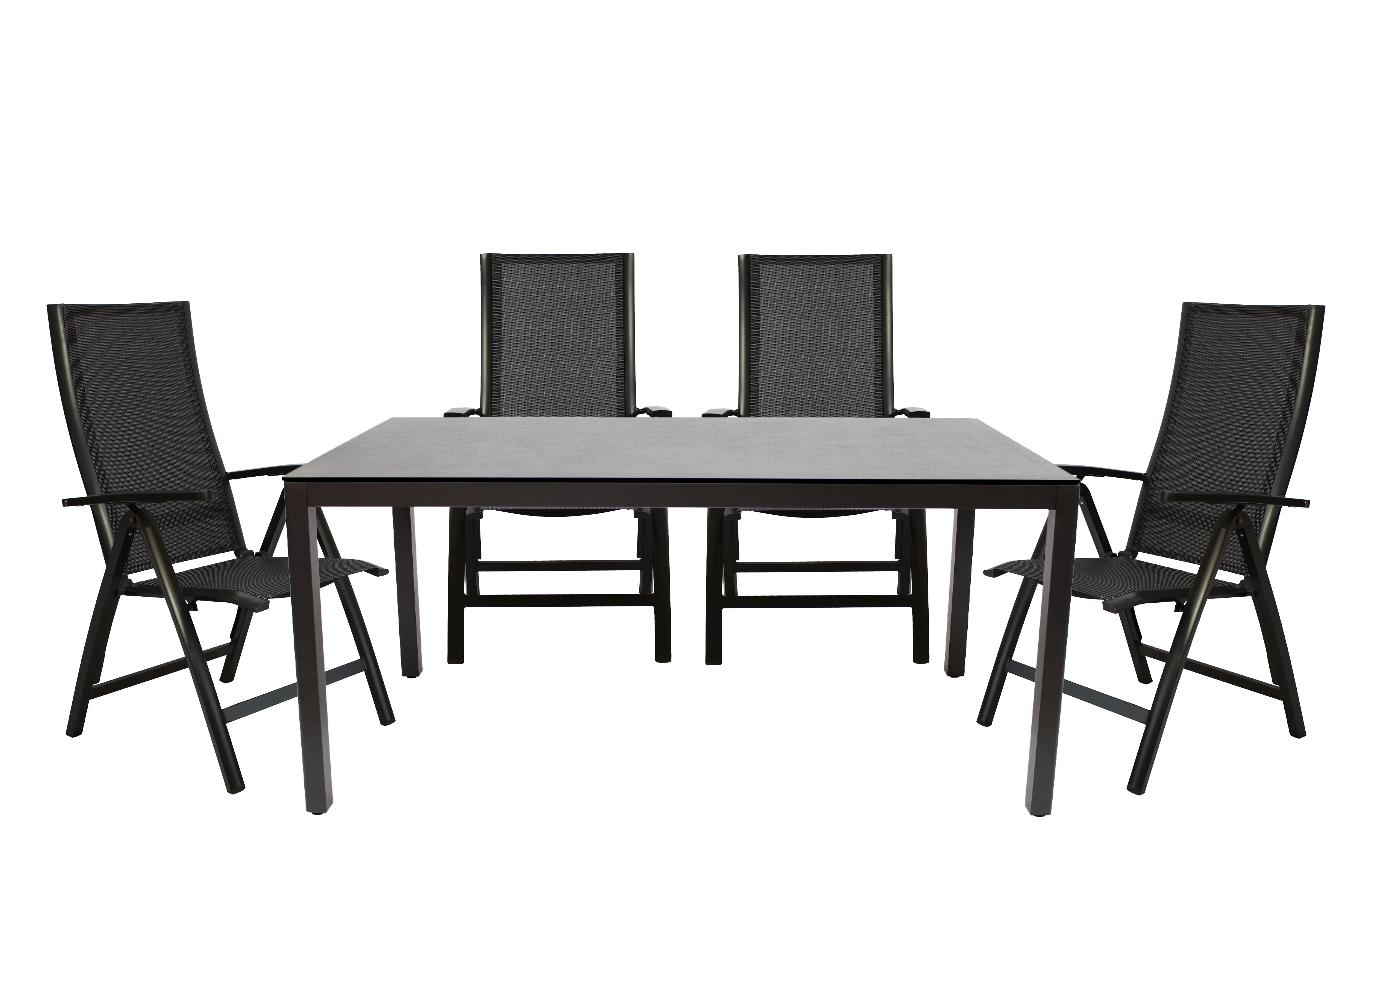 set ventura tisch seattle sessel verstellbar metallm bel gartenm bel bellandris. Black Bedroom Furniture Sets. Home Design Ideas